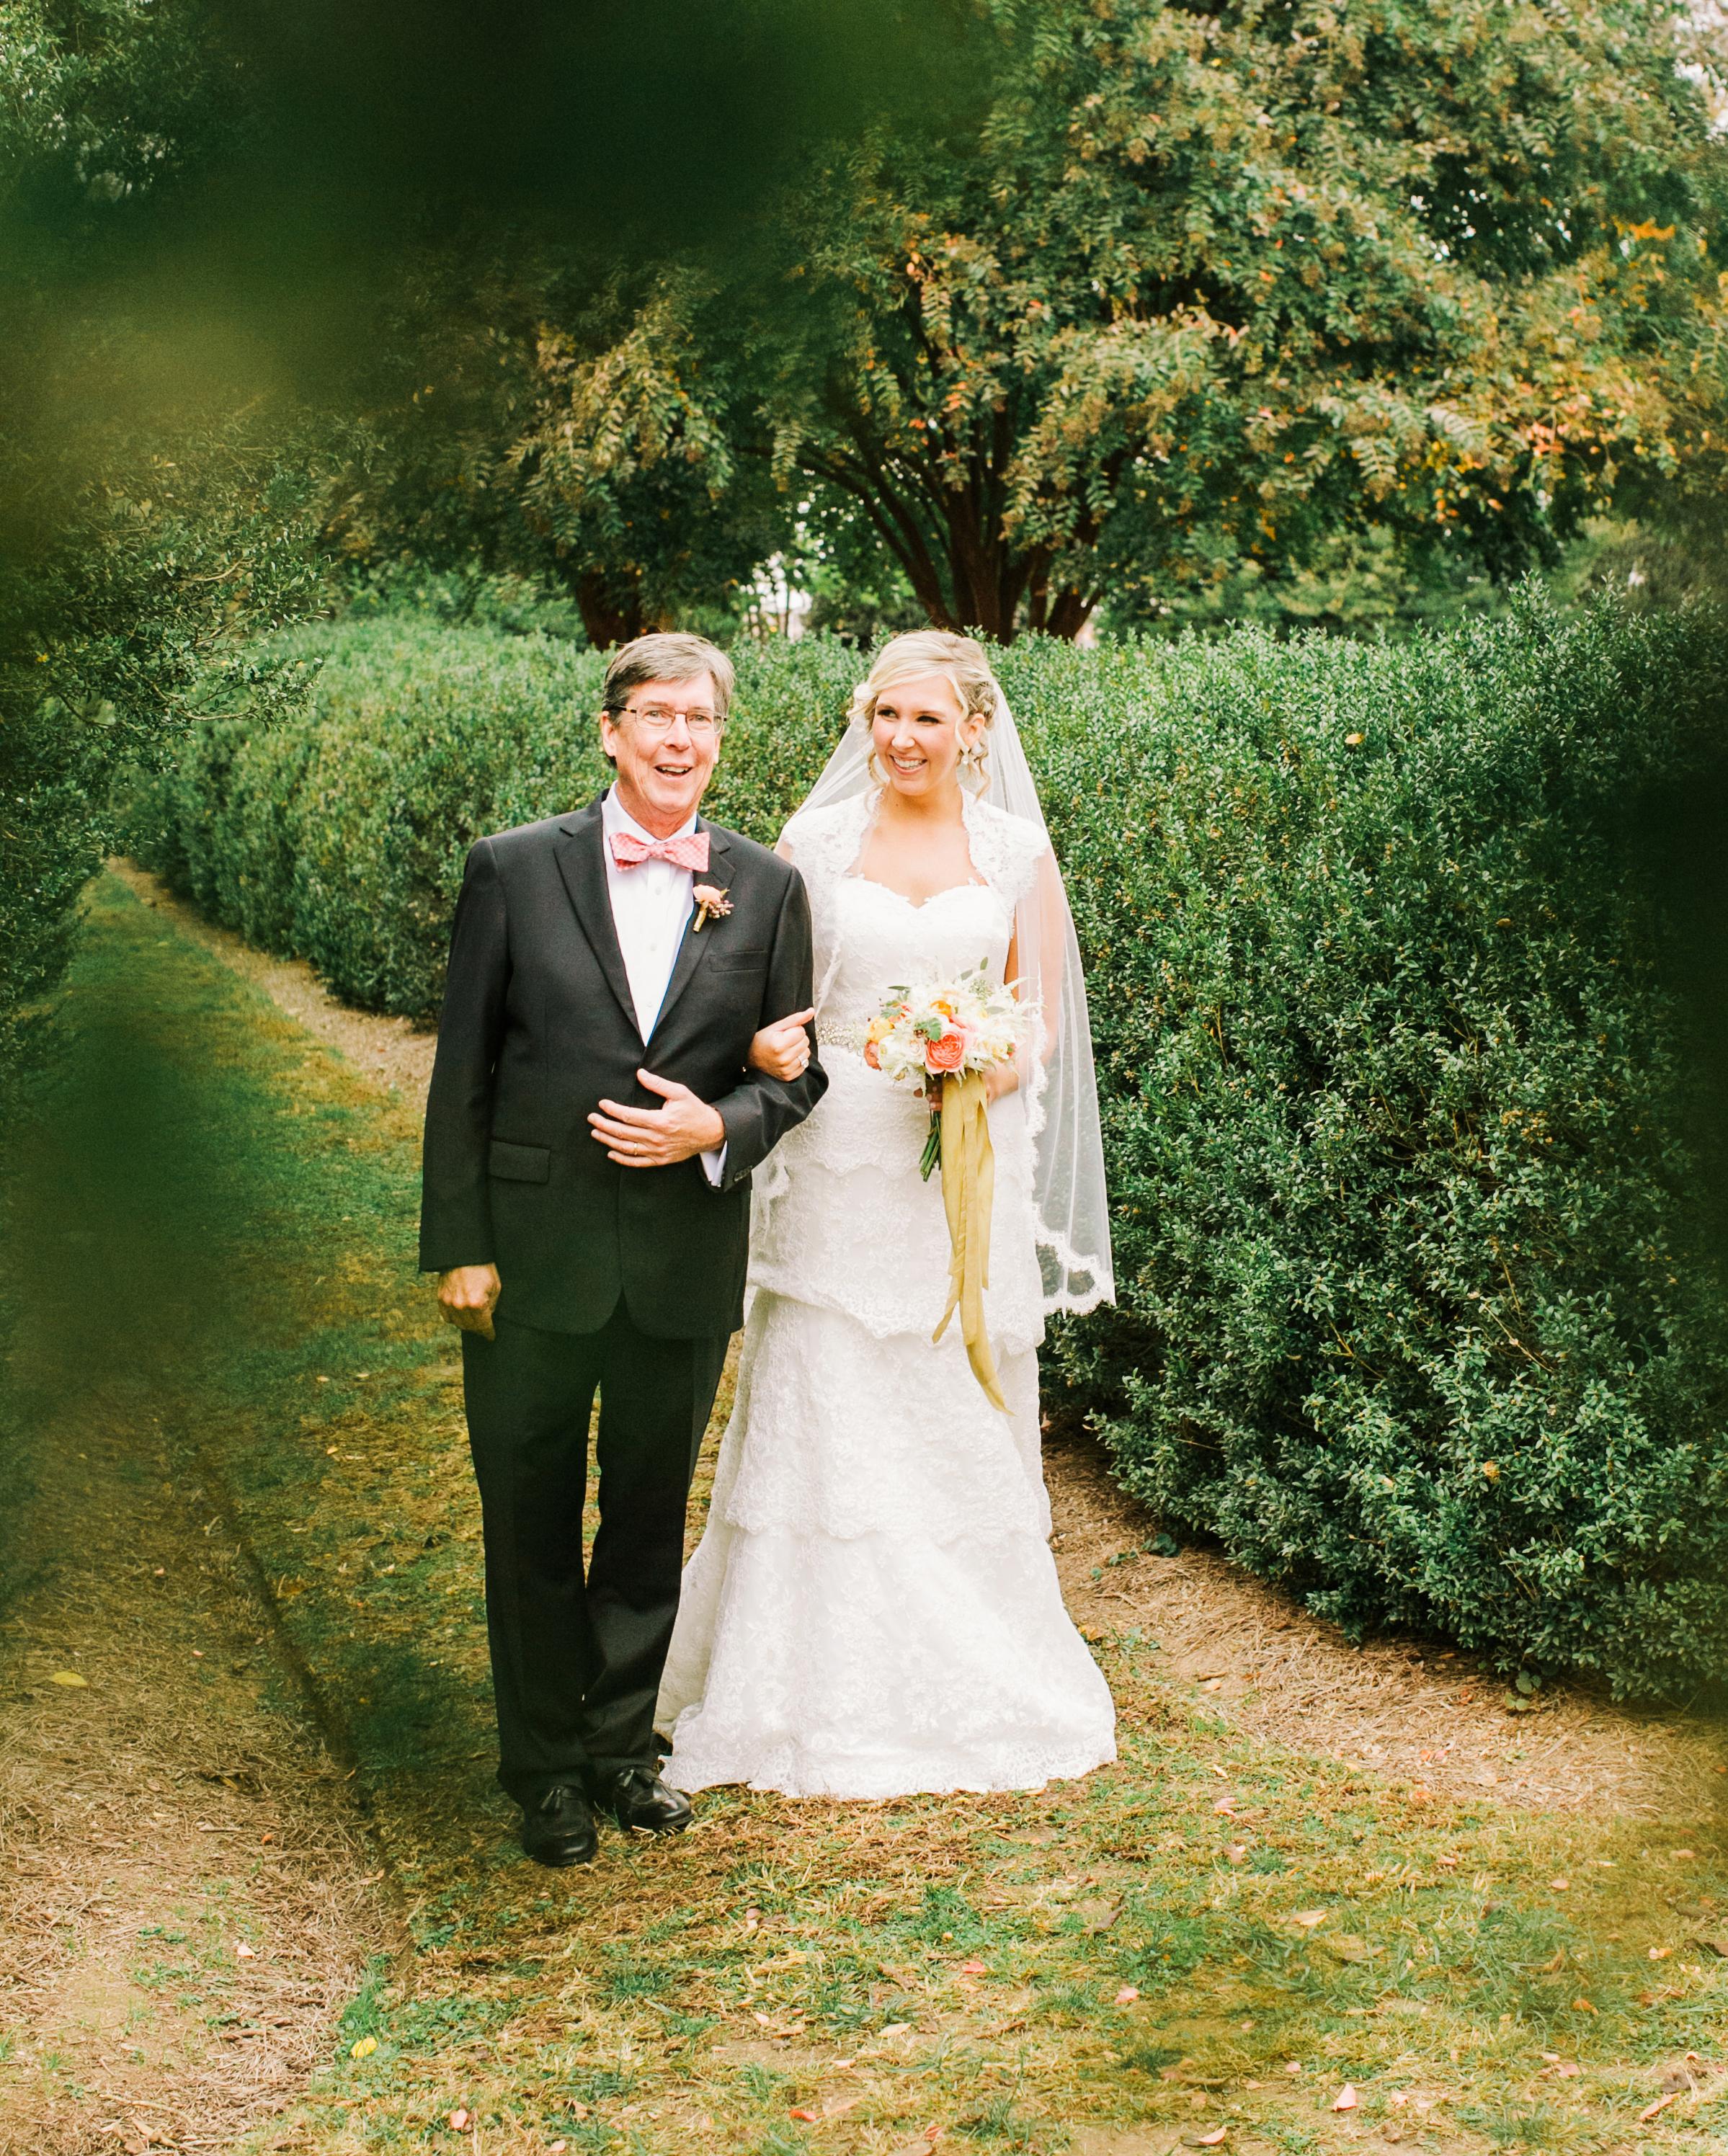 brittany-andrew-wedding-dad-051-s112067-0715.jpg